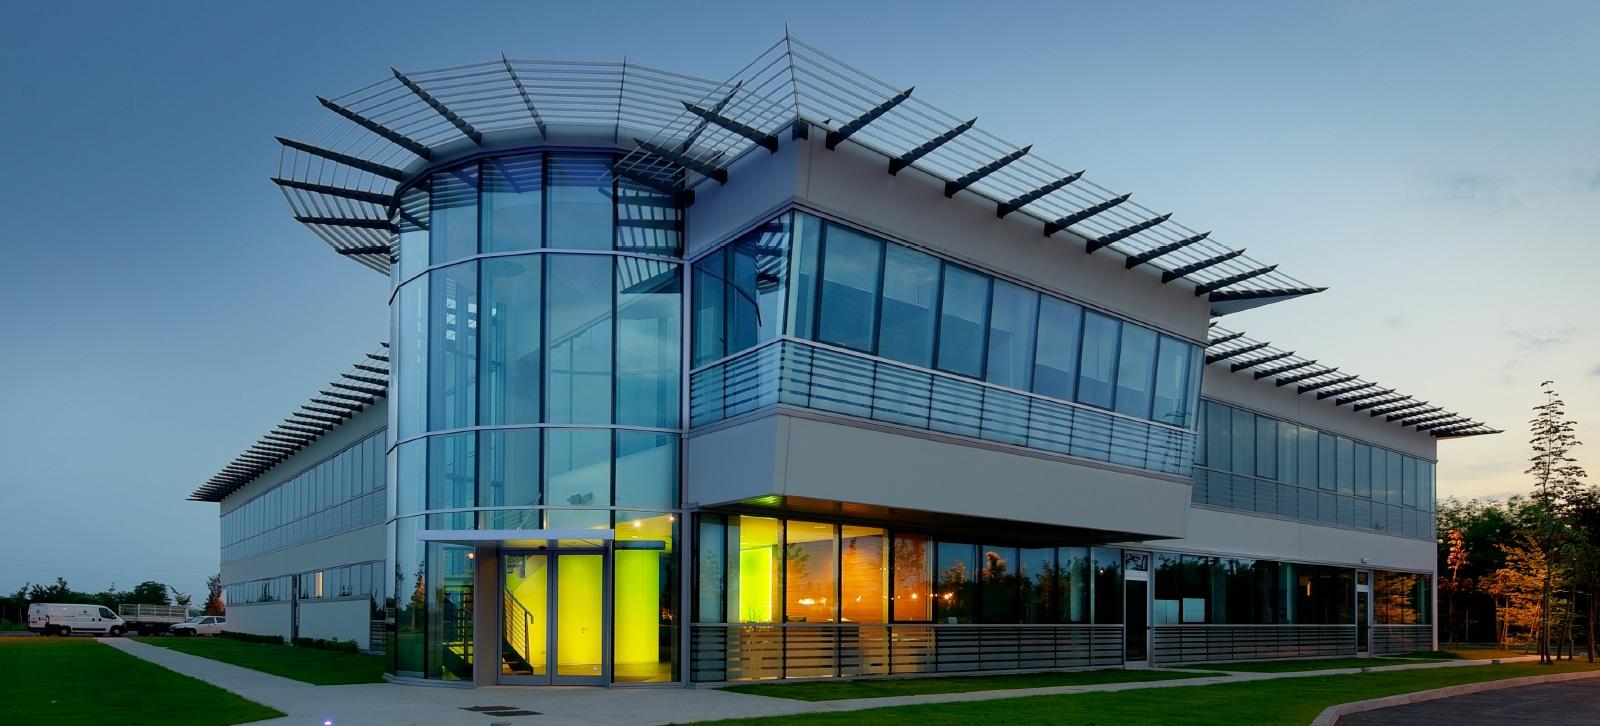 La sede di Euro & Promos